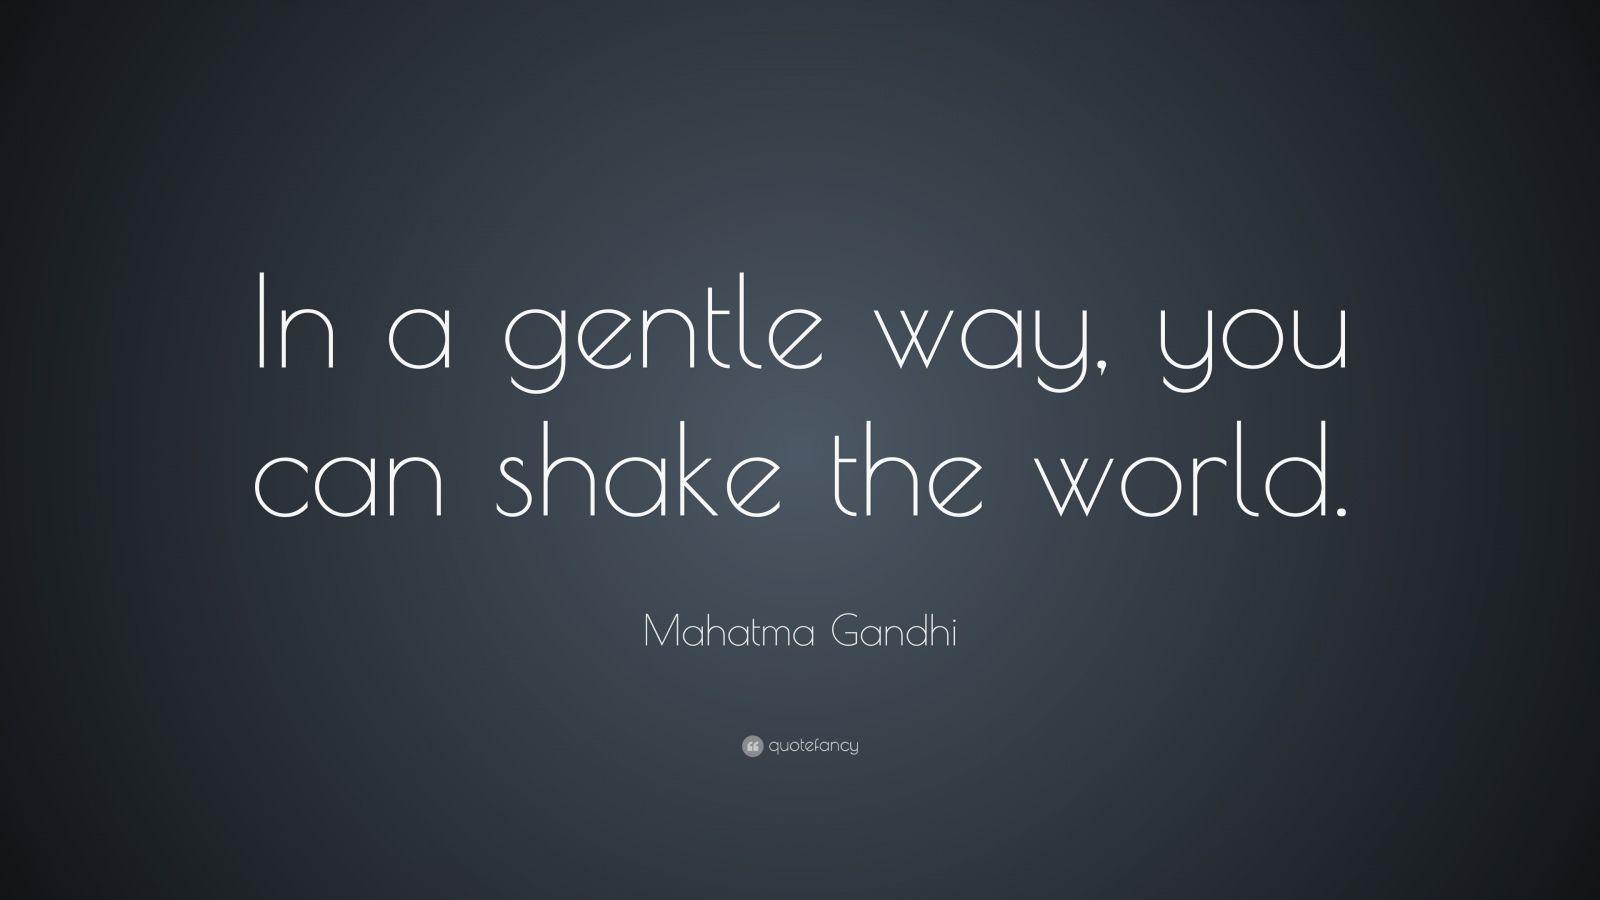 Mahatma Gandhi in the Way You Can Shake a Gentle World